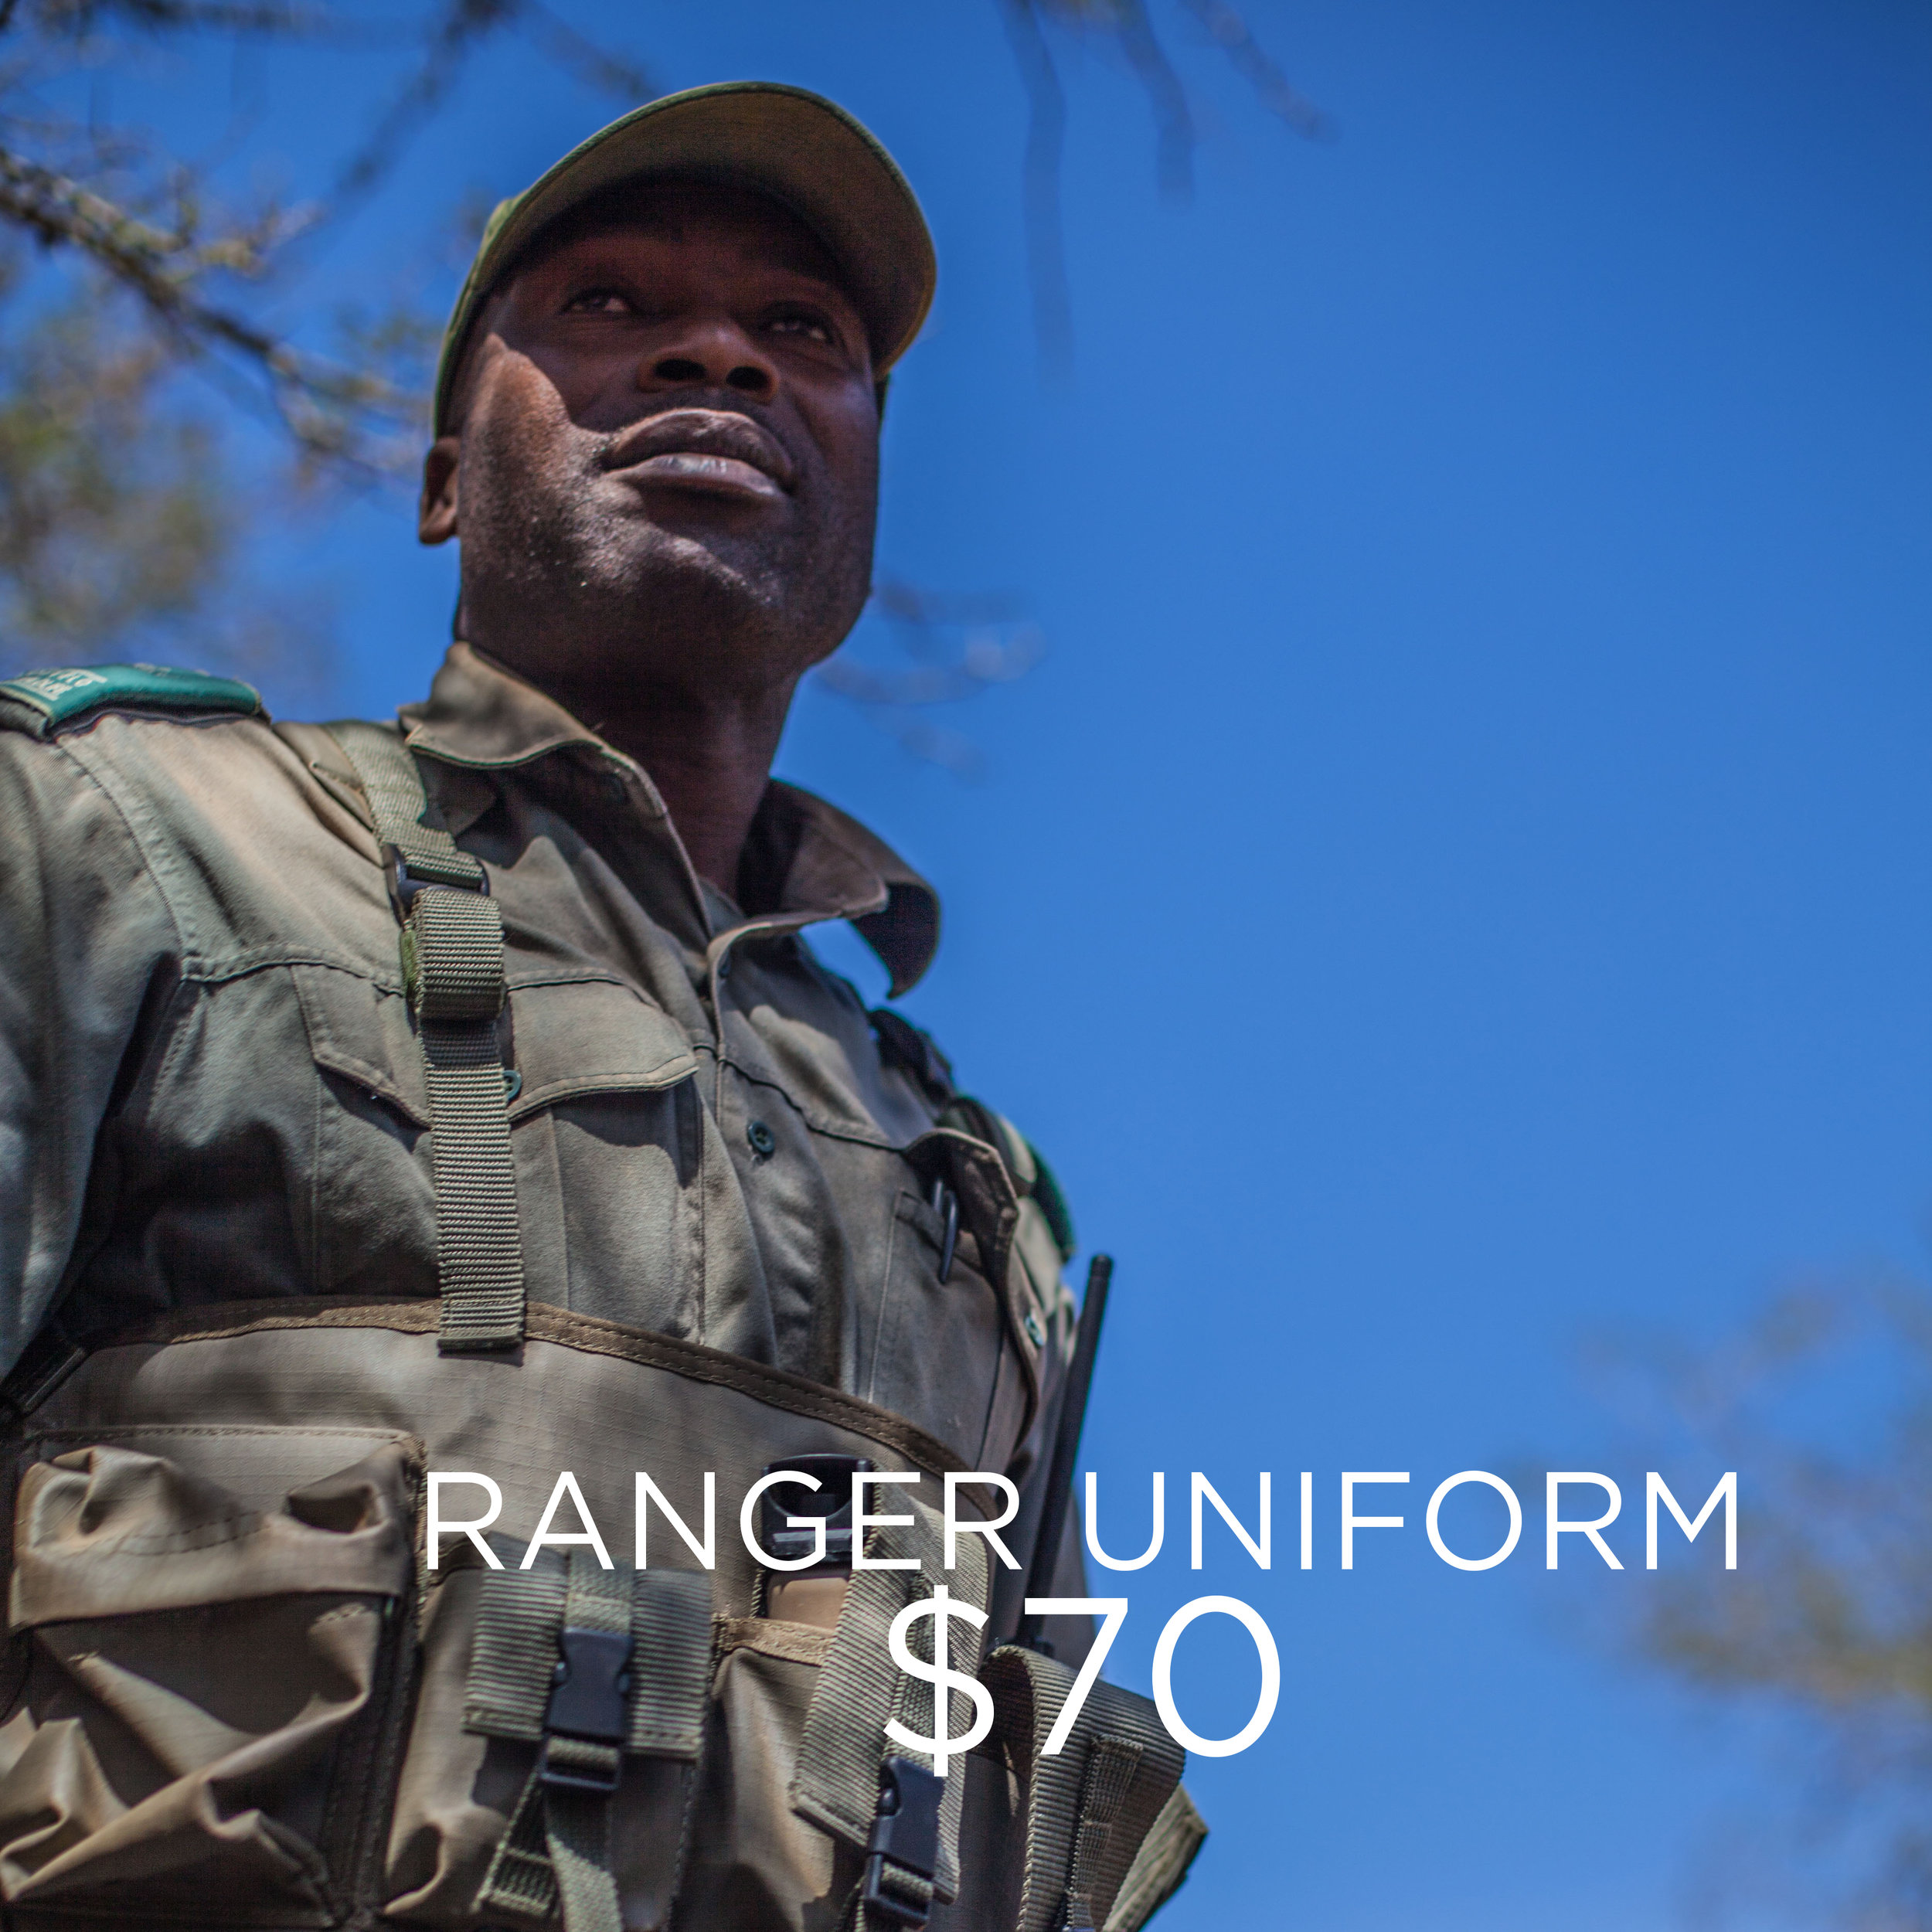 ranger_uniform-2.jpg